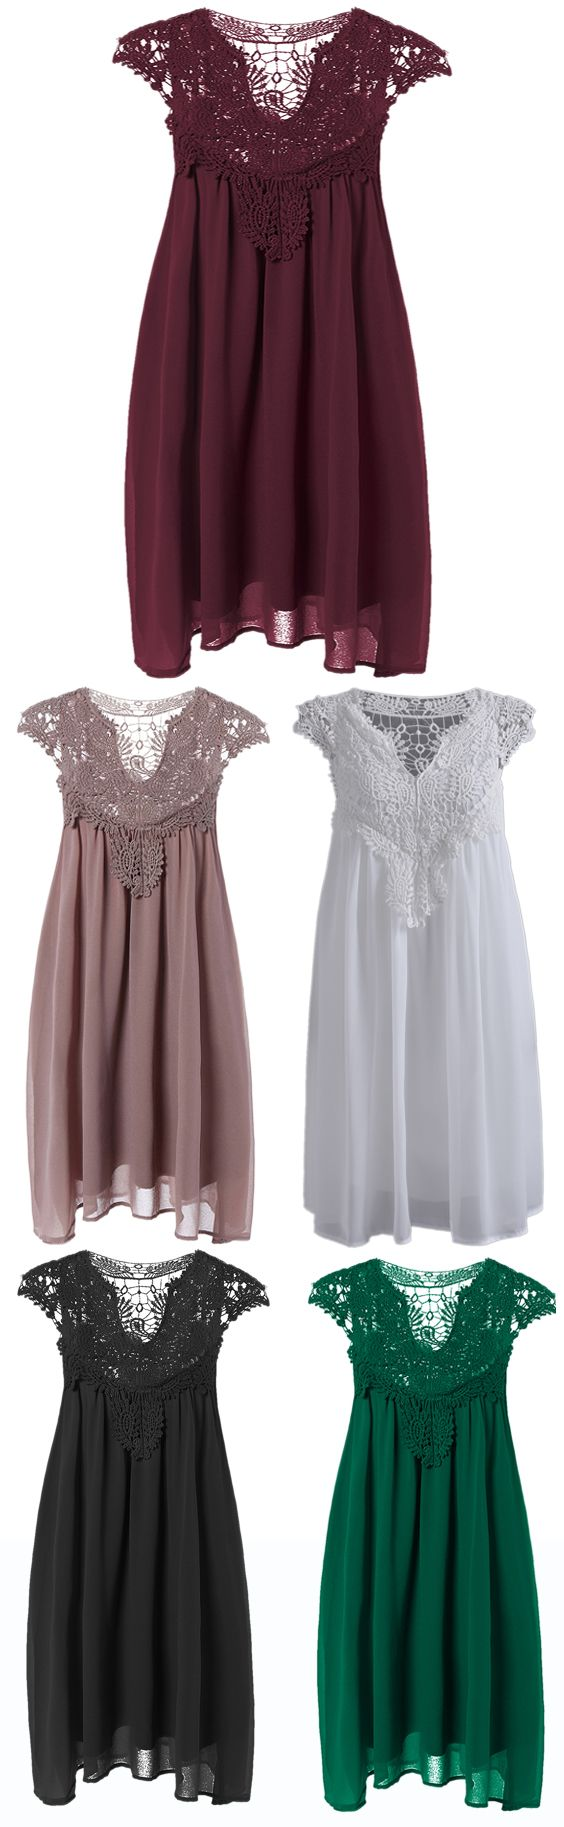 Plus Size Lace Spliced Hollow Out Dress